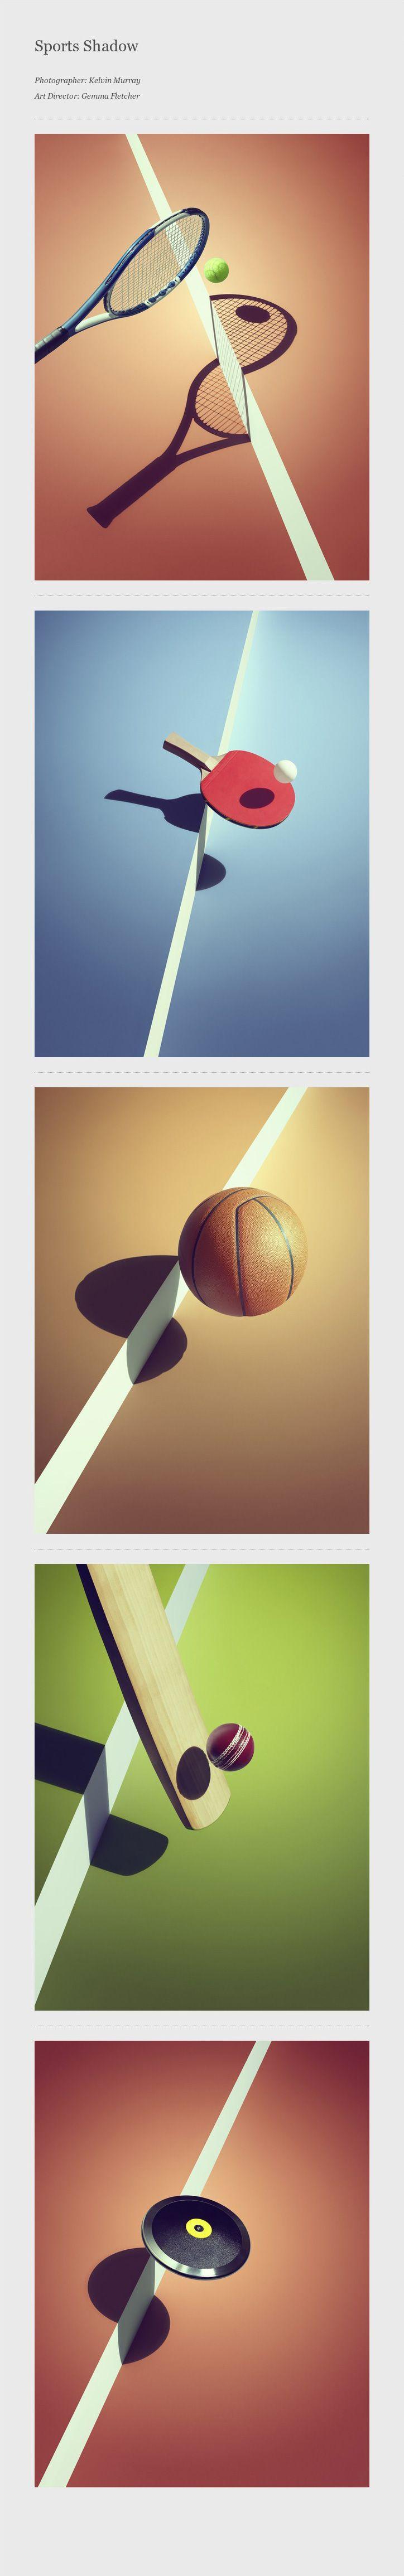 Sports Shadow by Gem Fletcher. #photography #sports | Pinned by DesignHandbook.net